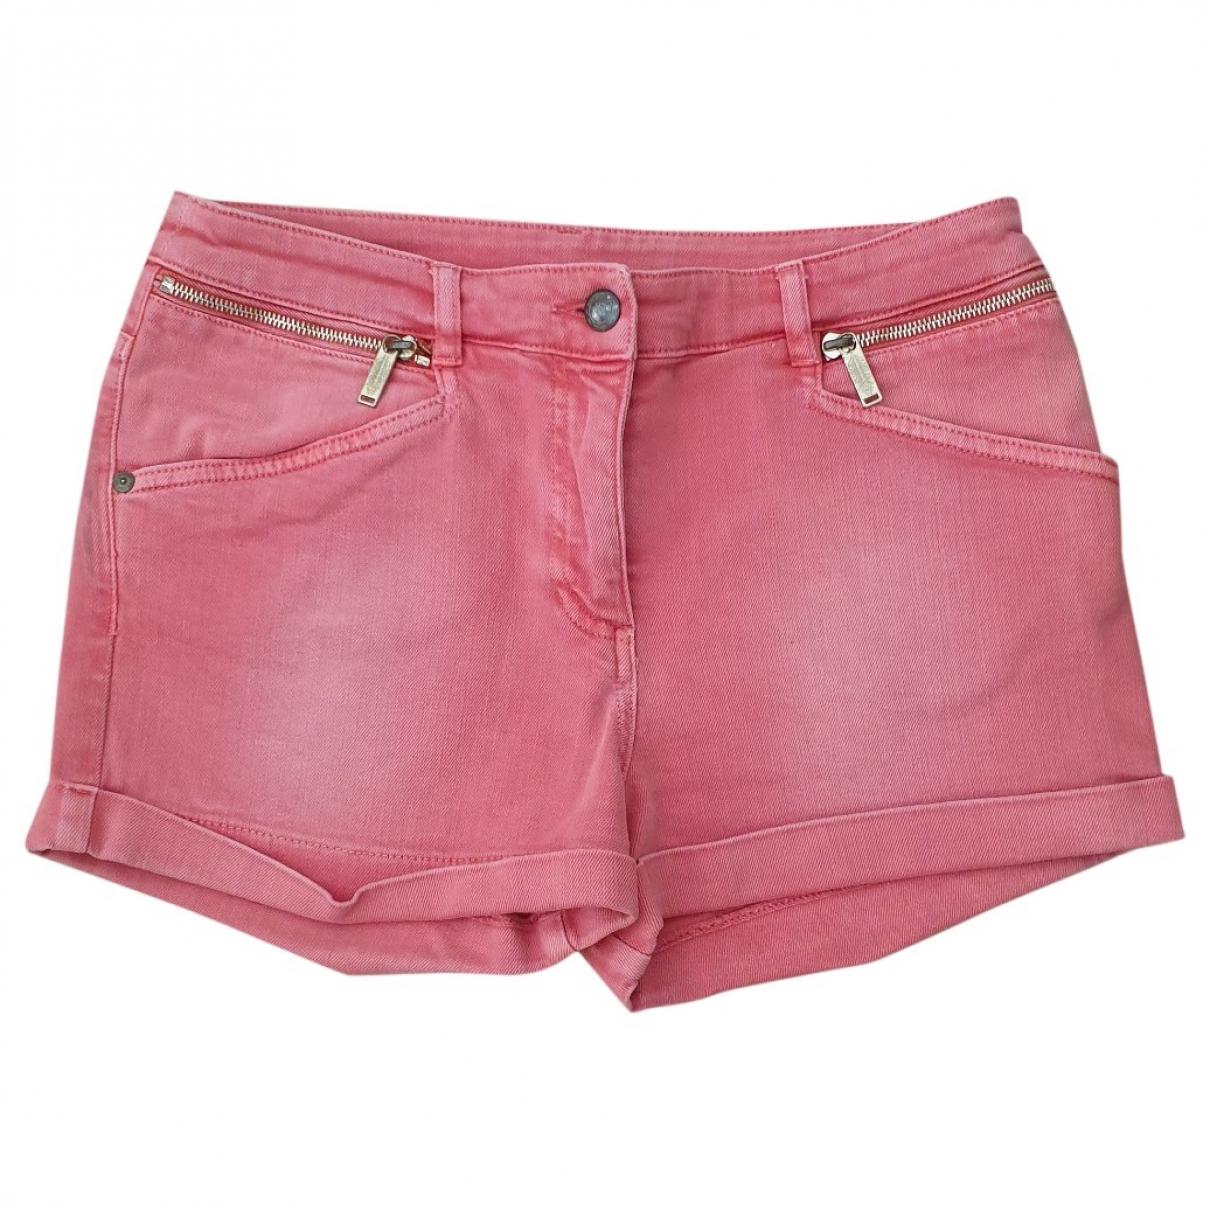 Matthew Williamson For H&m \N Pink Denim - Jeans Shorts for Women 36 FR